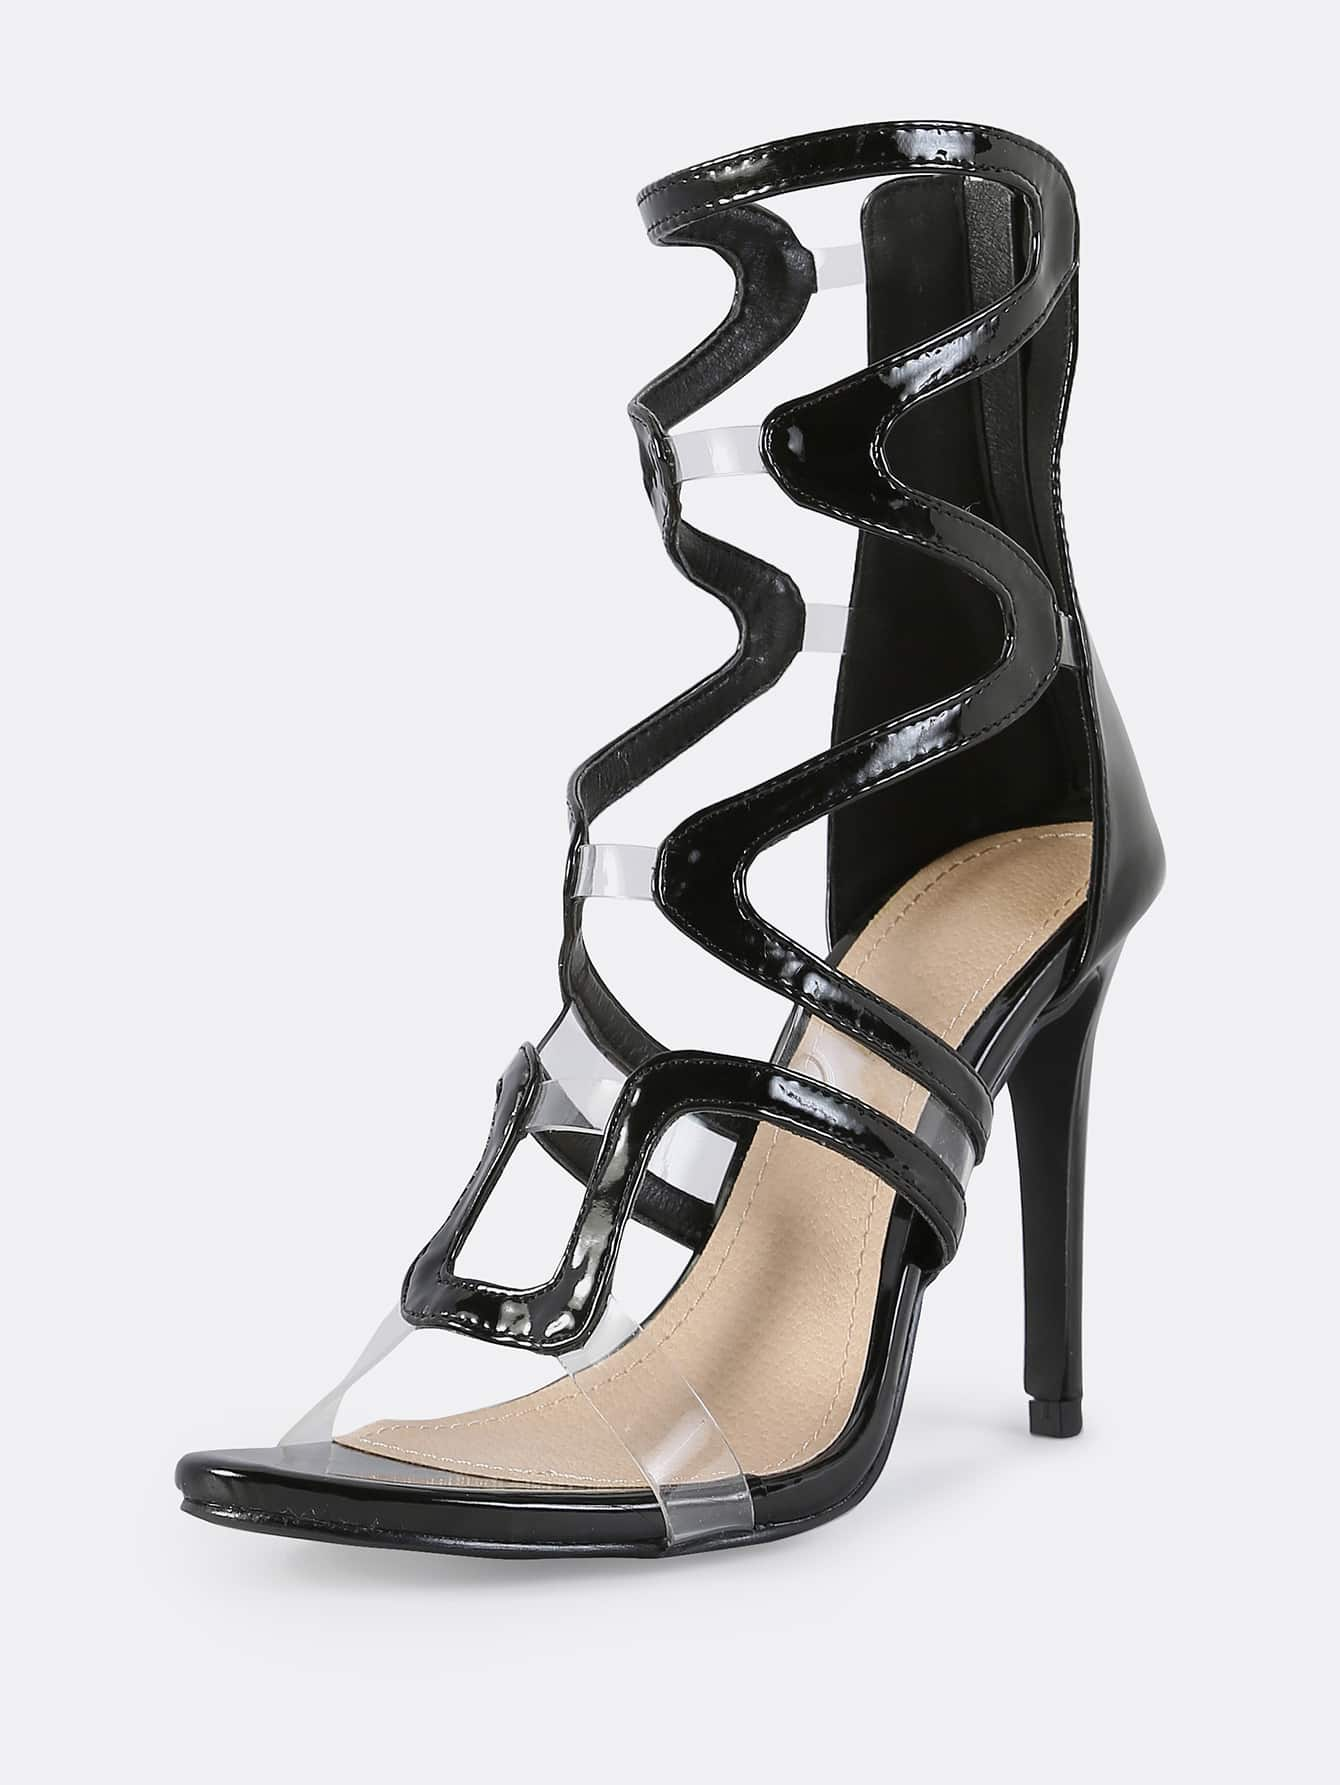 high heel shoe chair value city stool wavy cut patent stiletto black shein sheinside